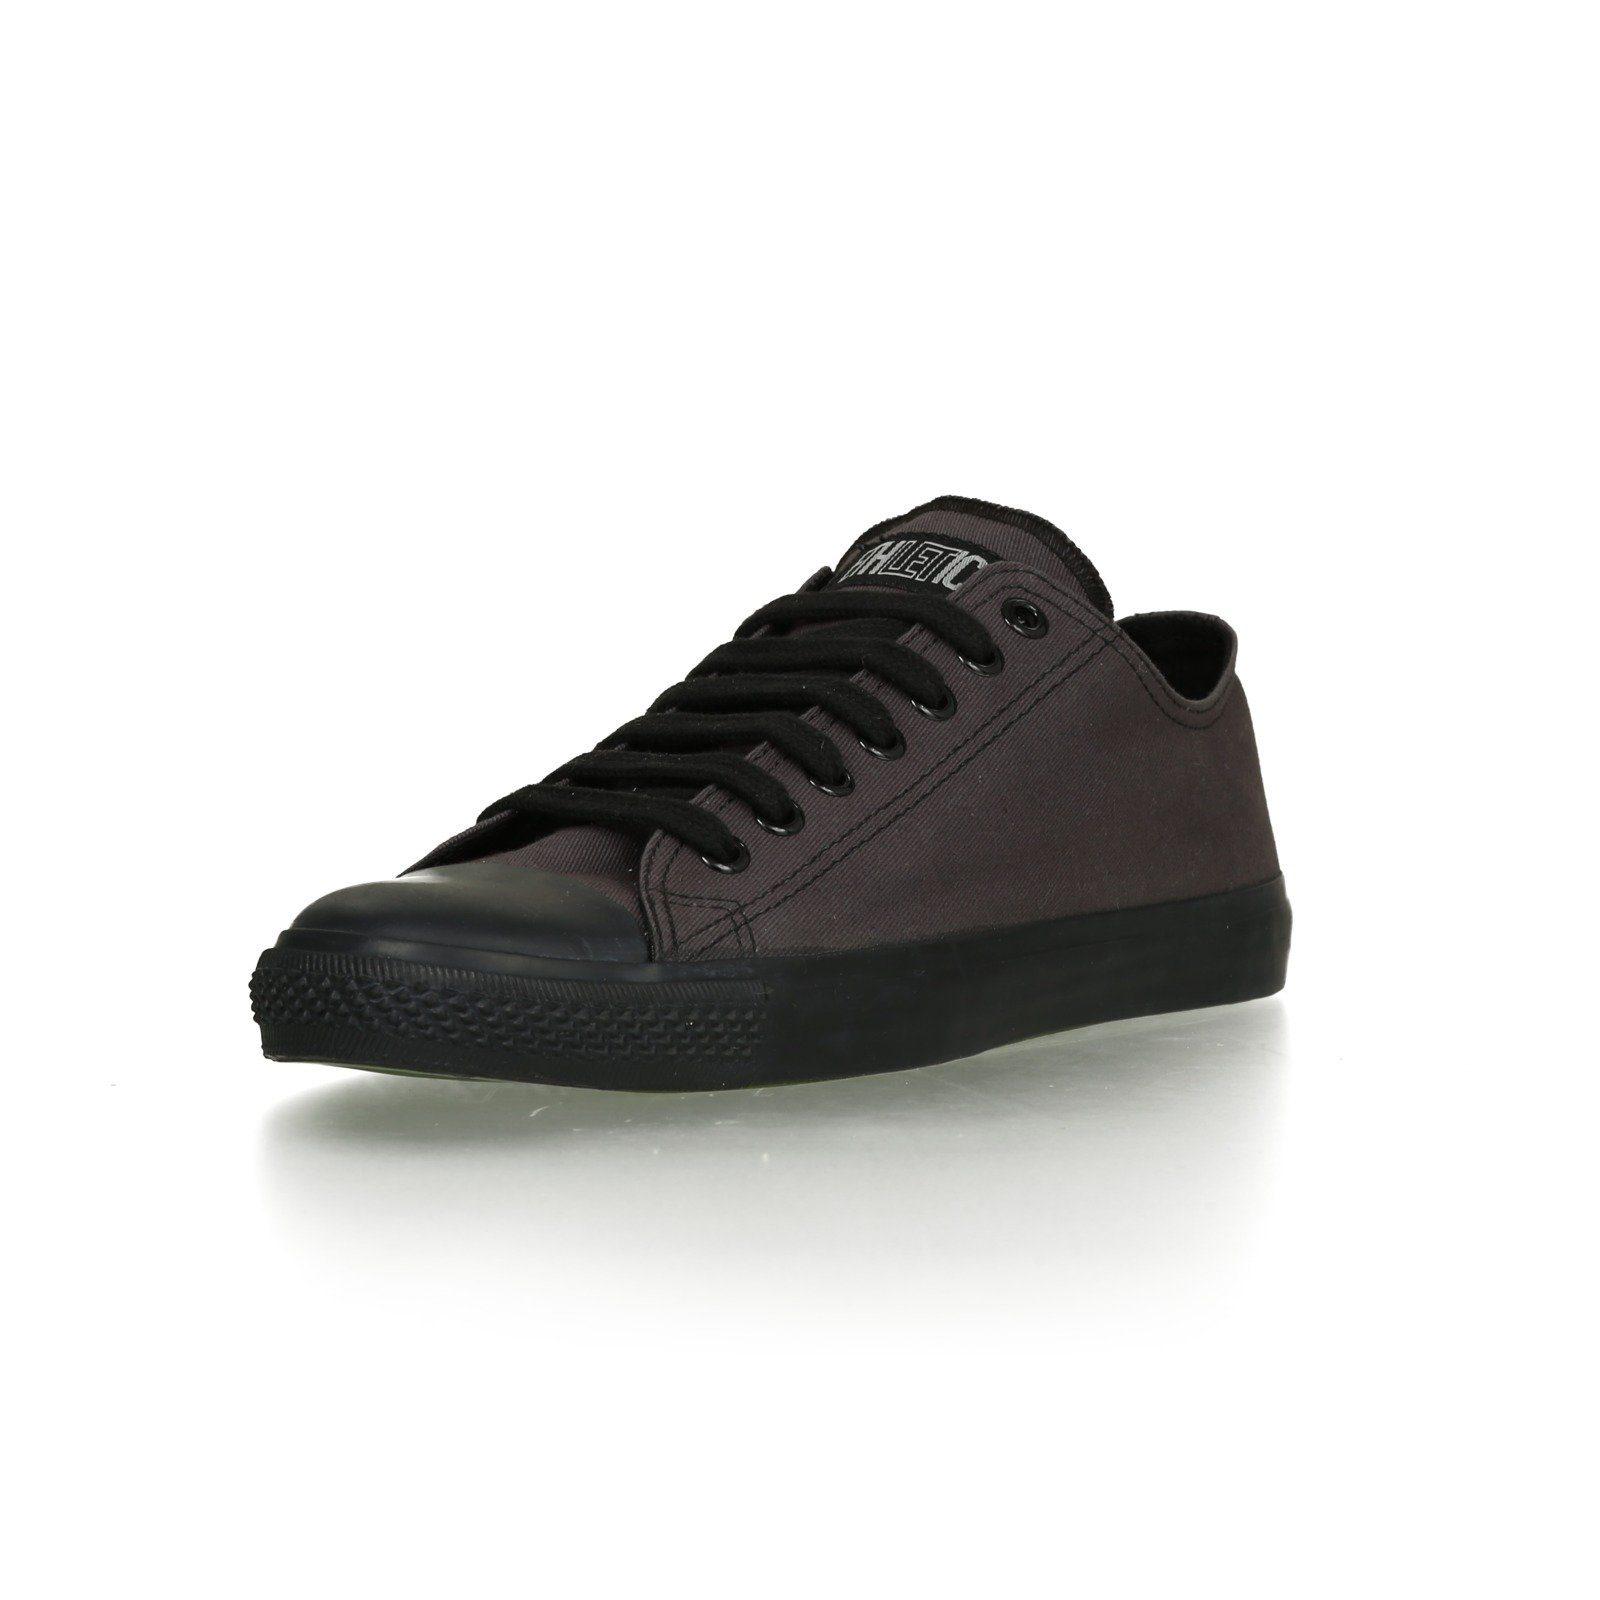 ETHLETIC Sneaker aus nachhaltiger Produktion Black Cap Lo Cut Classic online kaufen  Pewter Grey   Jet Black